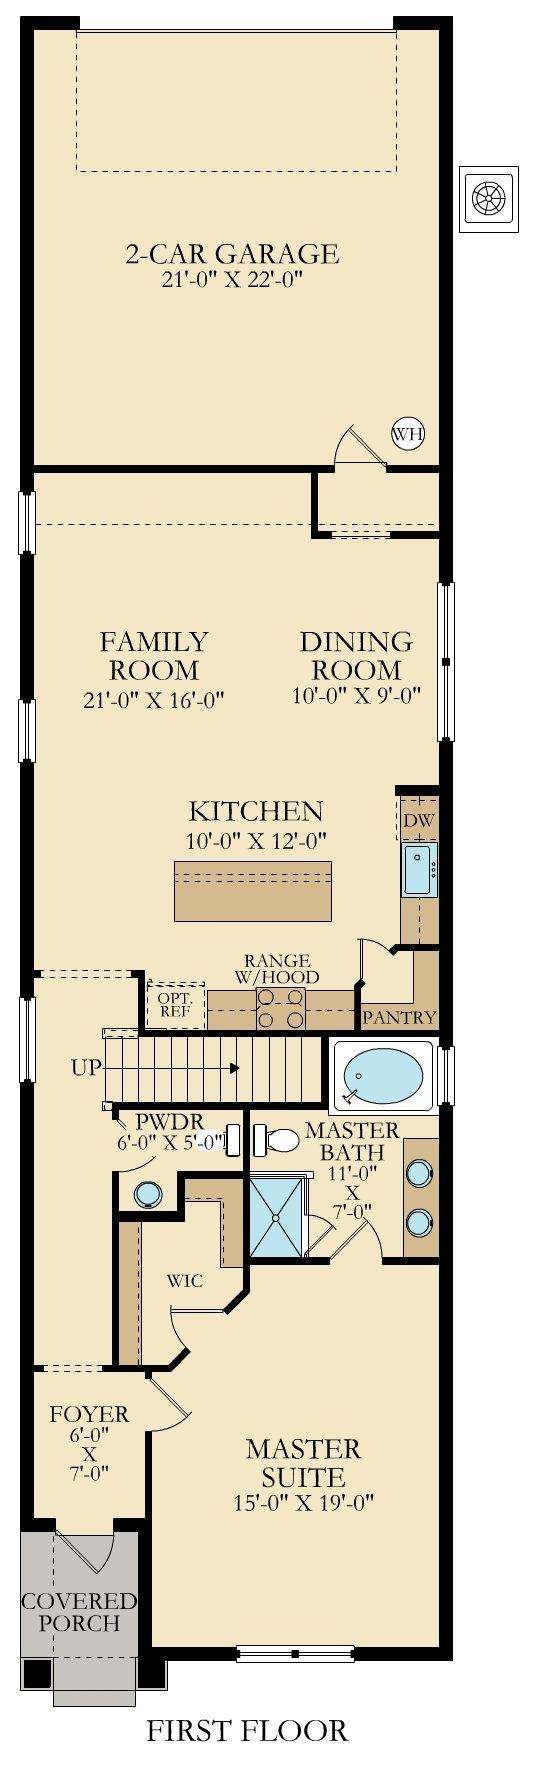 asheville-floorplan.jpg